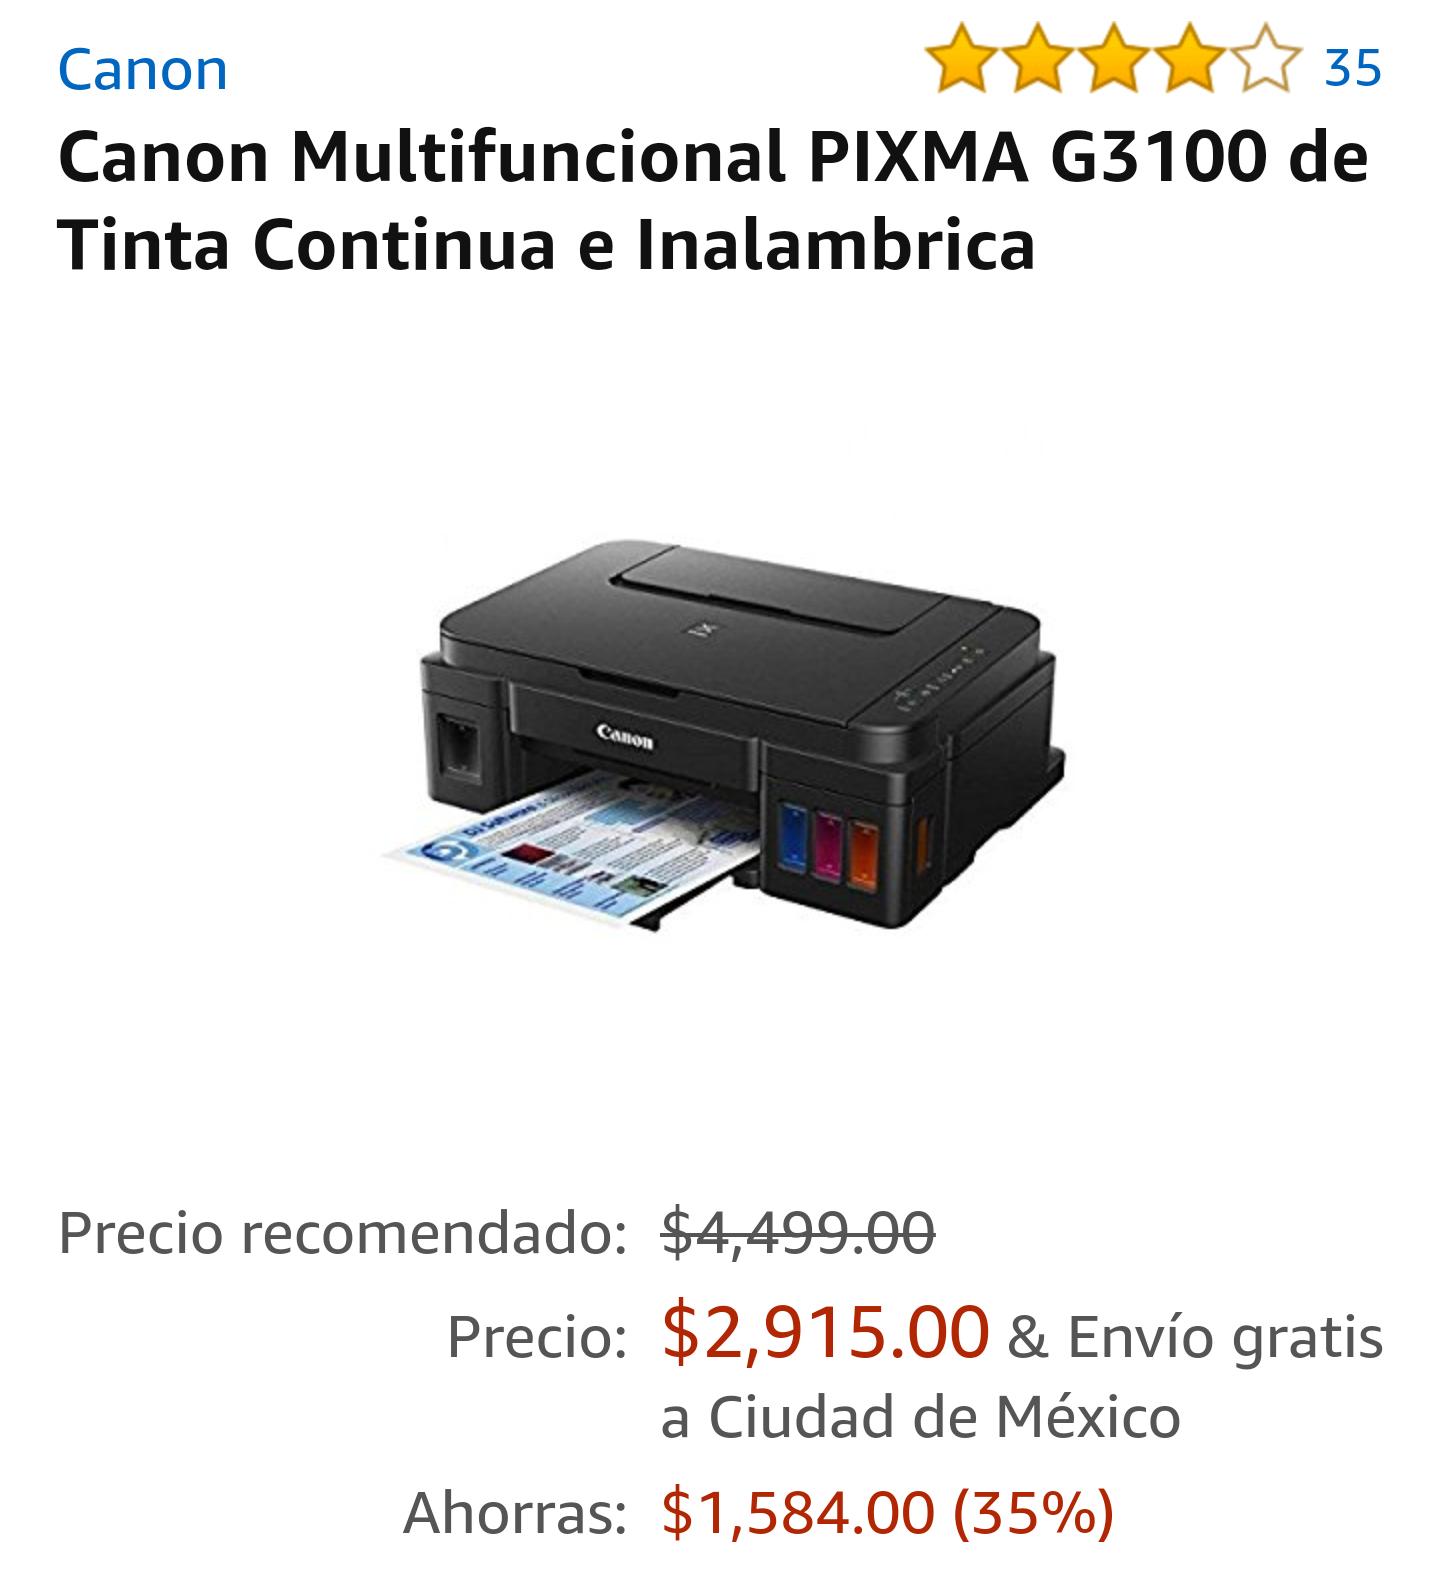 Amazon: Canon Pixma G3100 multifuncional tinta continua